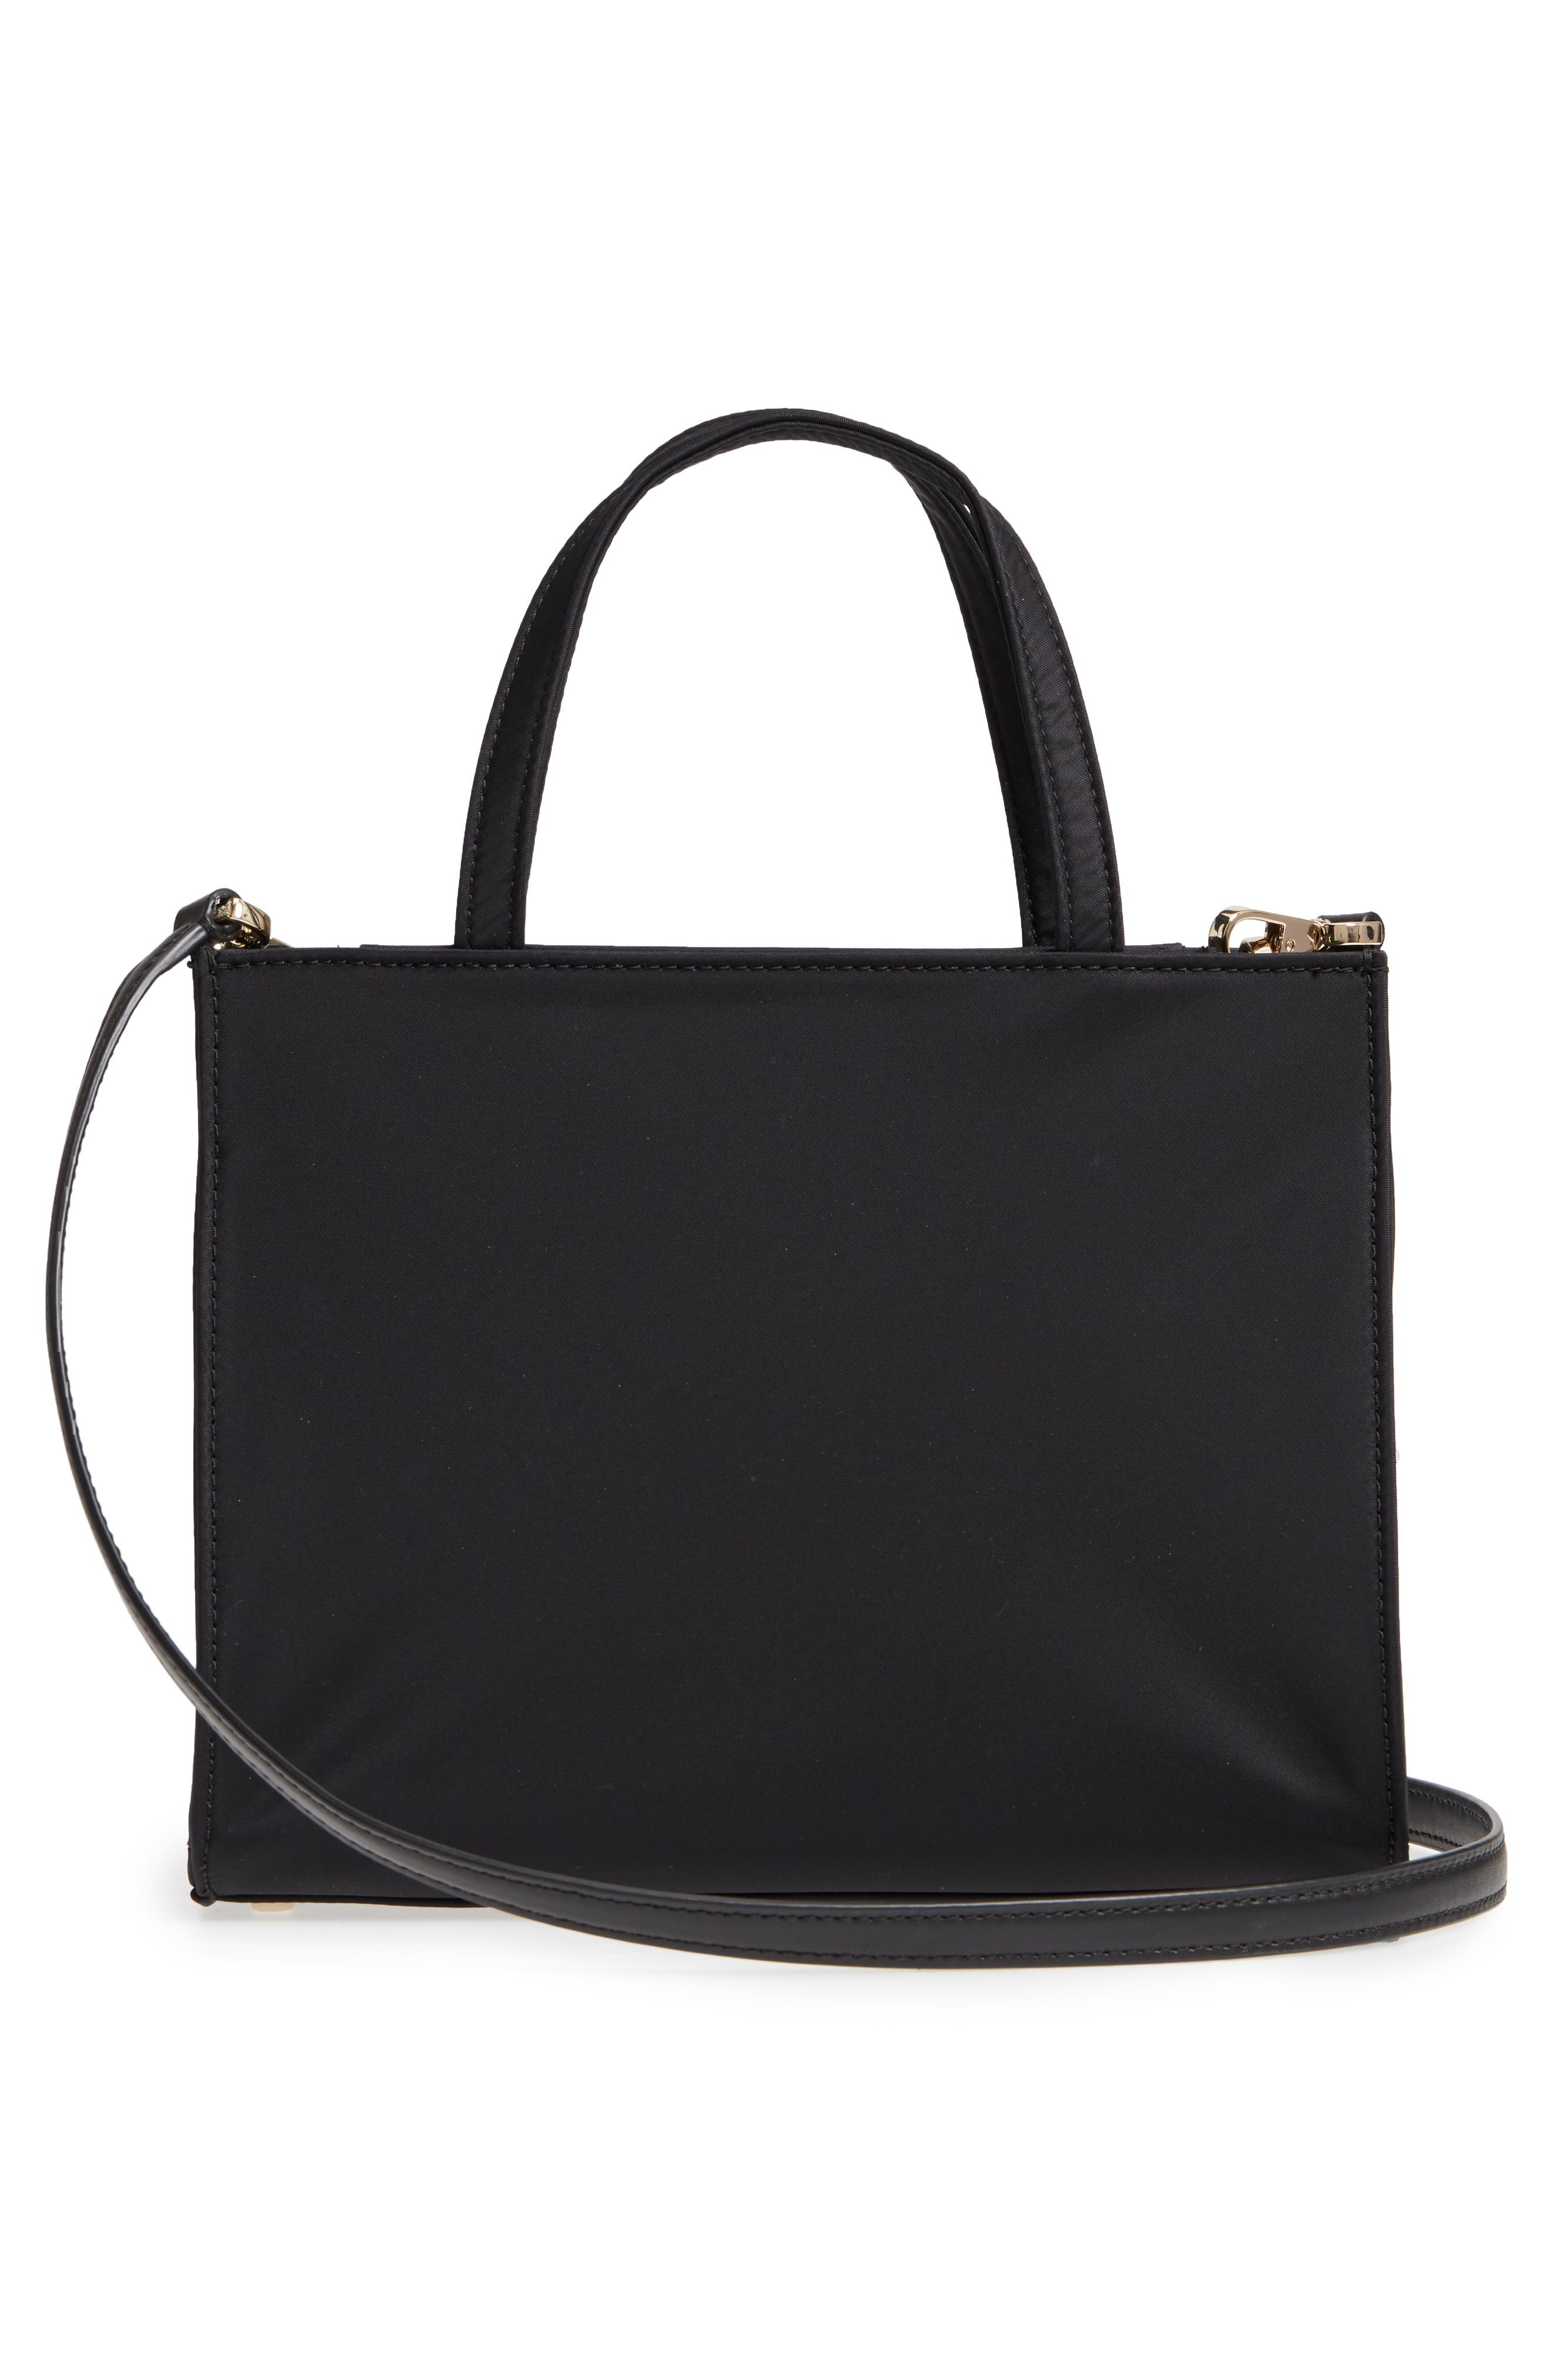 watson lane – sam nylon satchel,                             Alternate thumbnail 3, color,                             BLACK